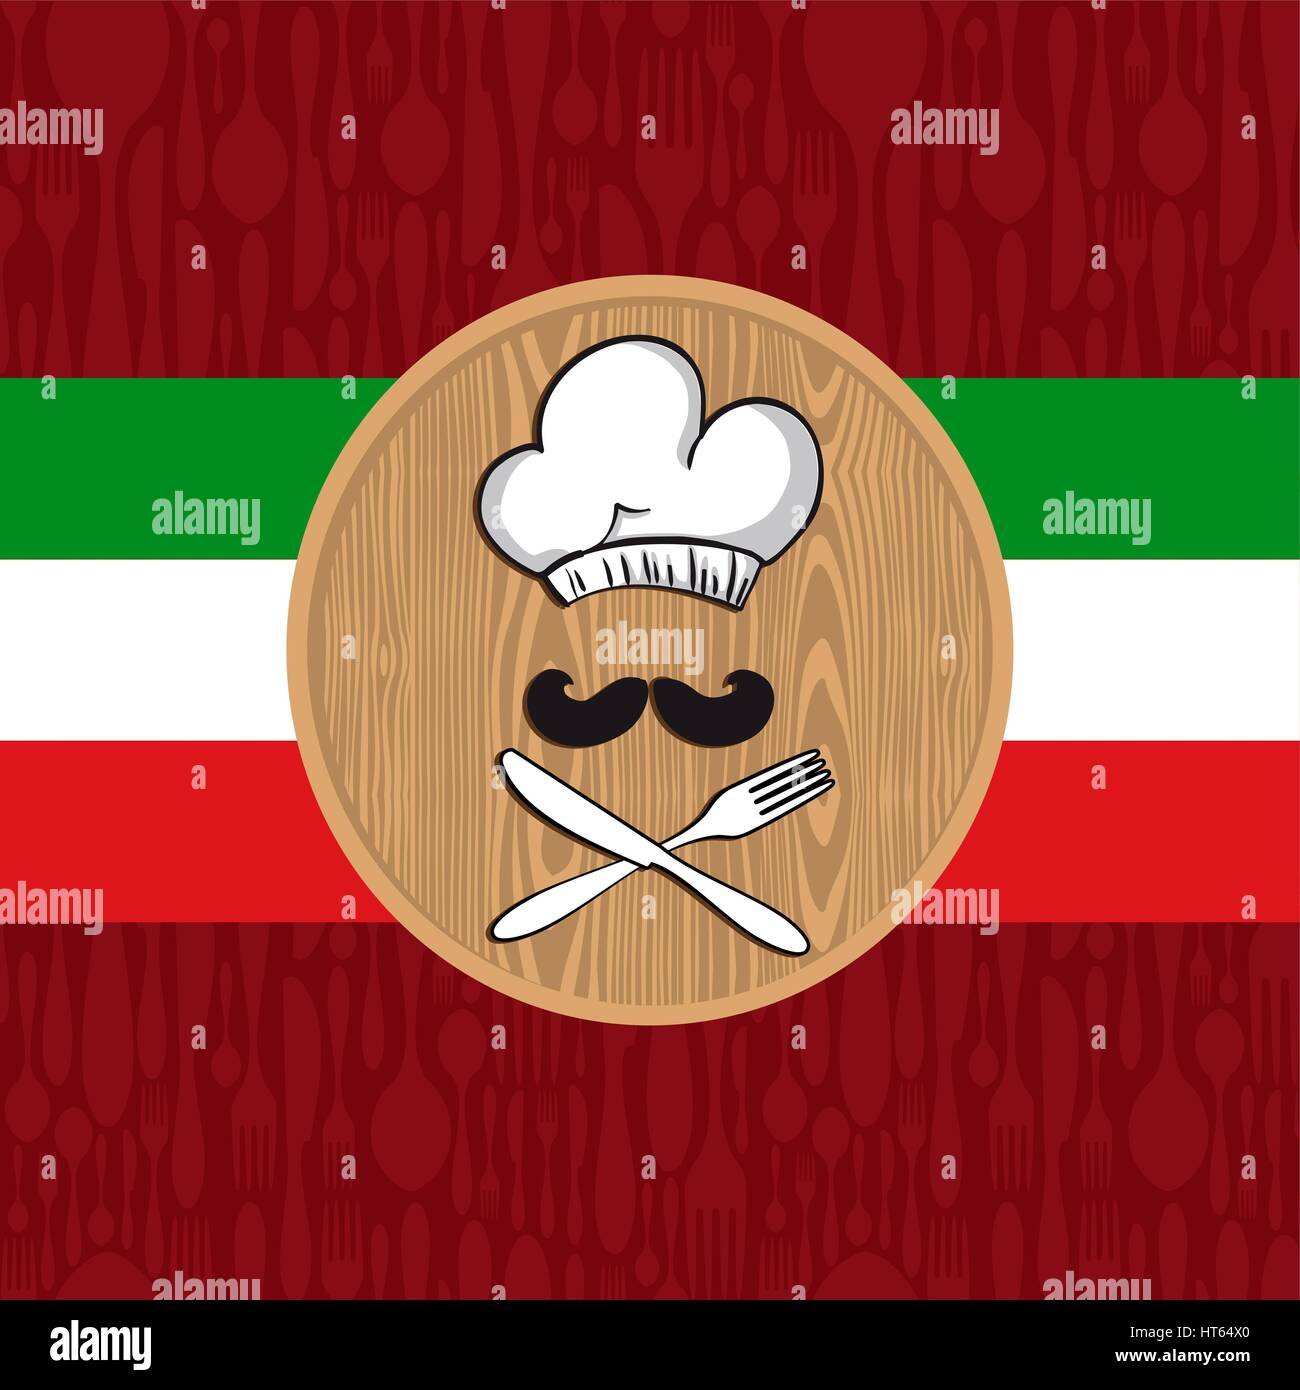 Illustration Cartoon Chef Cook Menu Stockfotos & Illustration ...